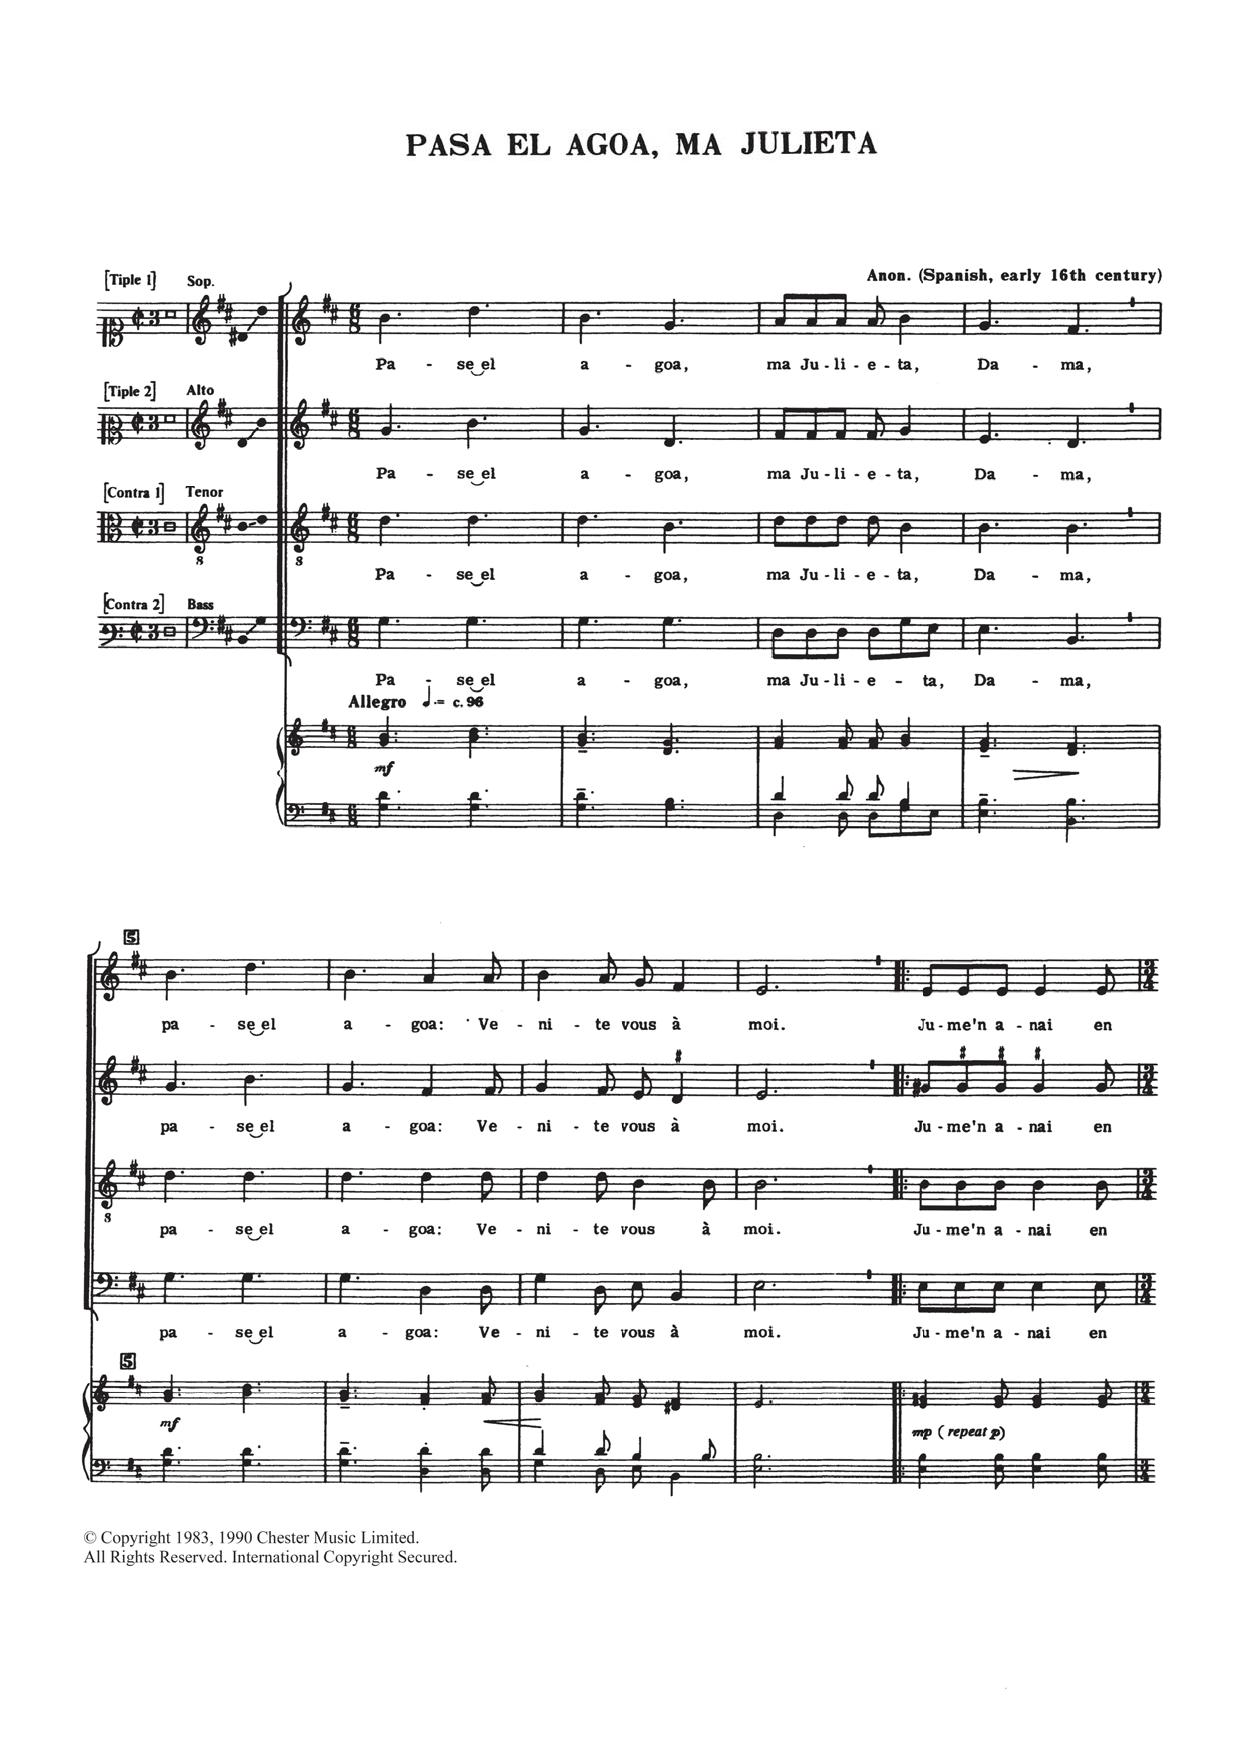 Traditional Pase El Agoa, Ma Julieta sheet music notes and chords. Download Printable PDF.